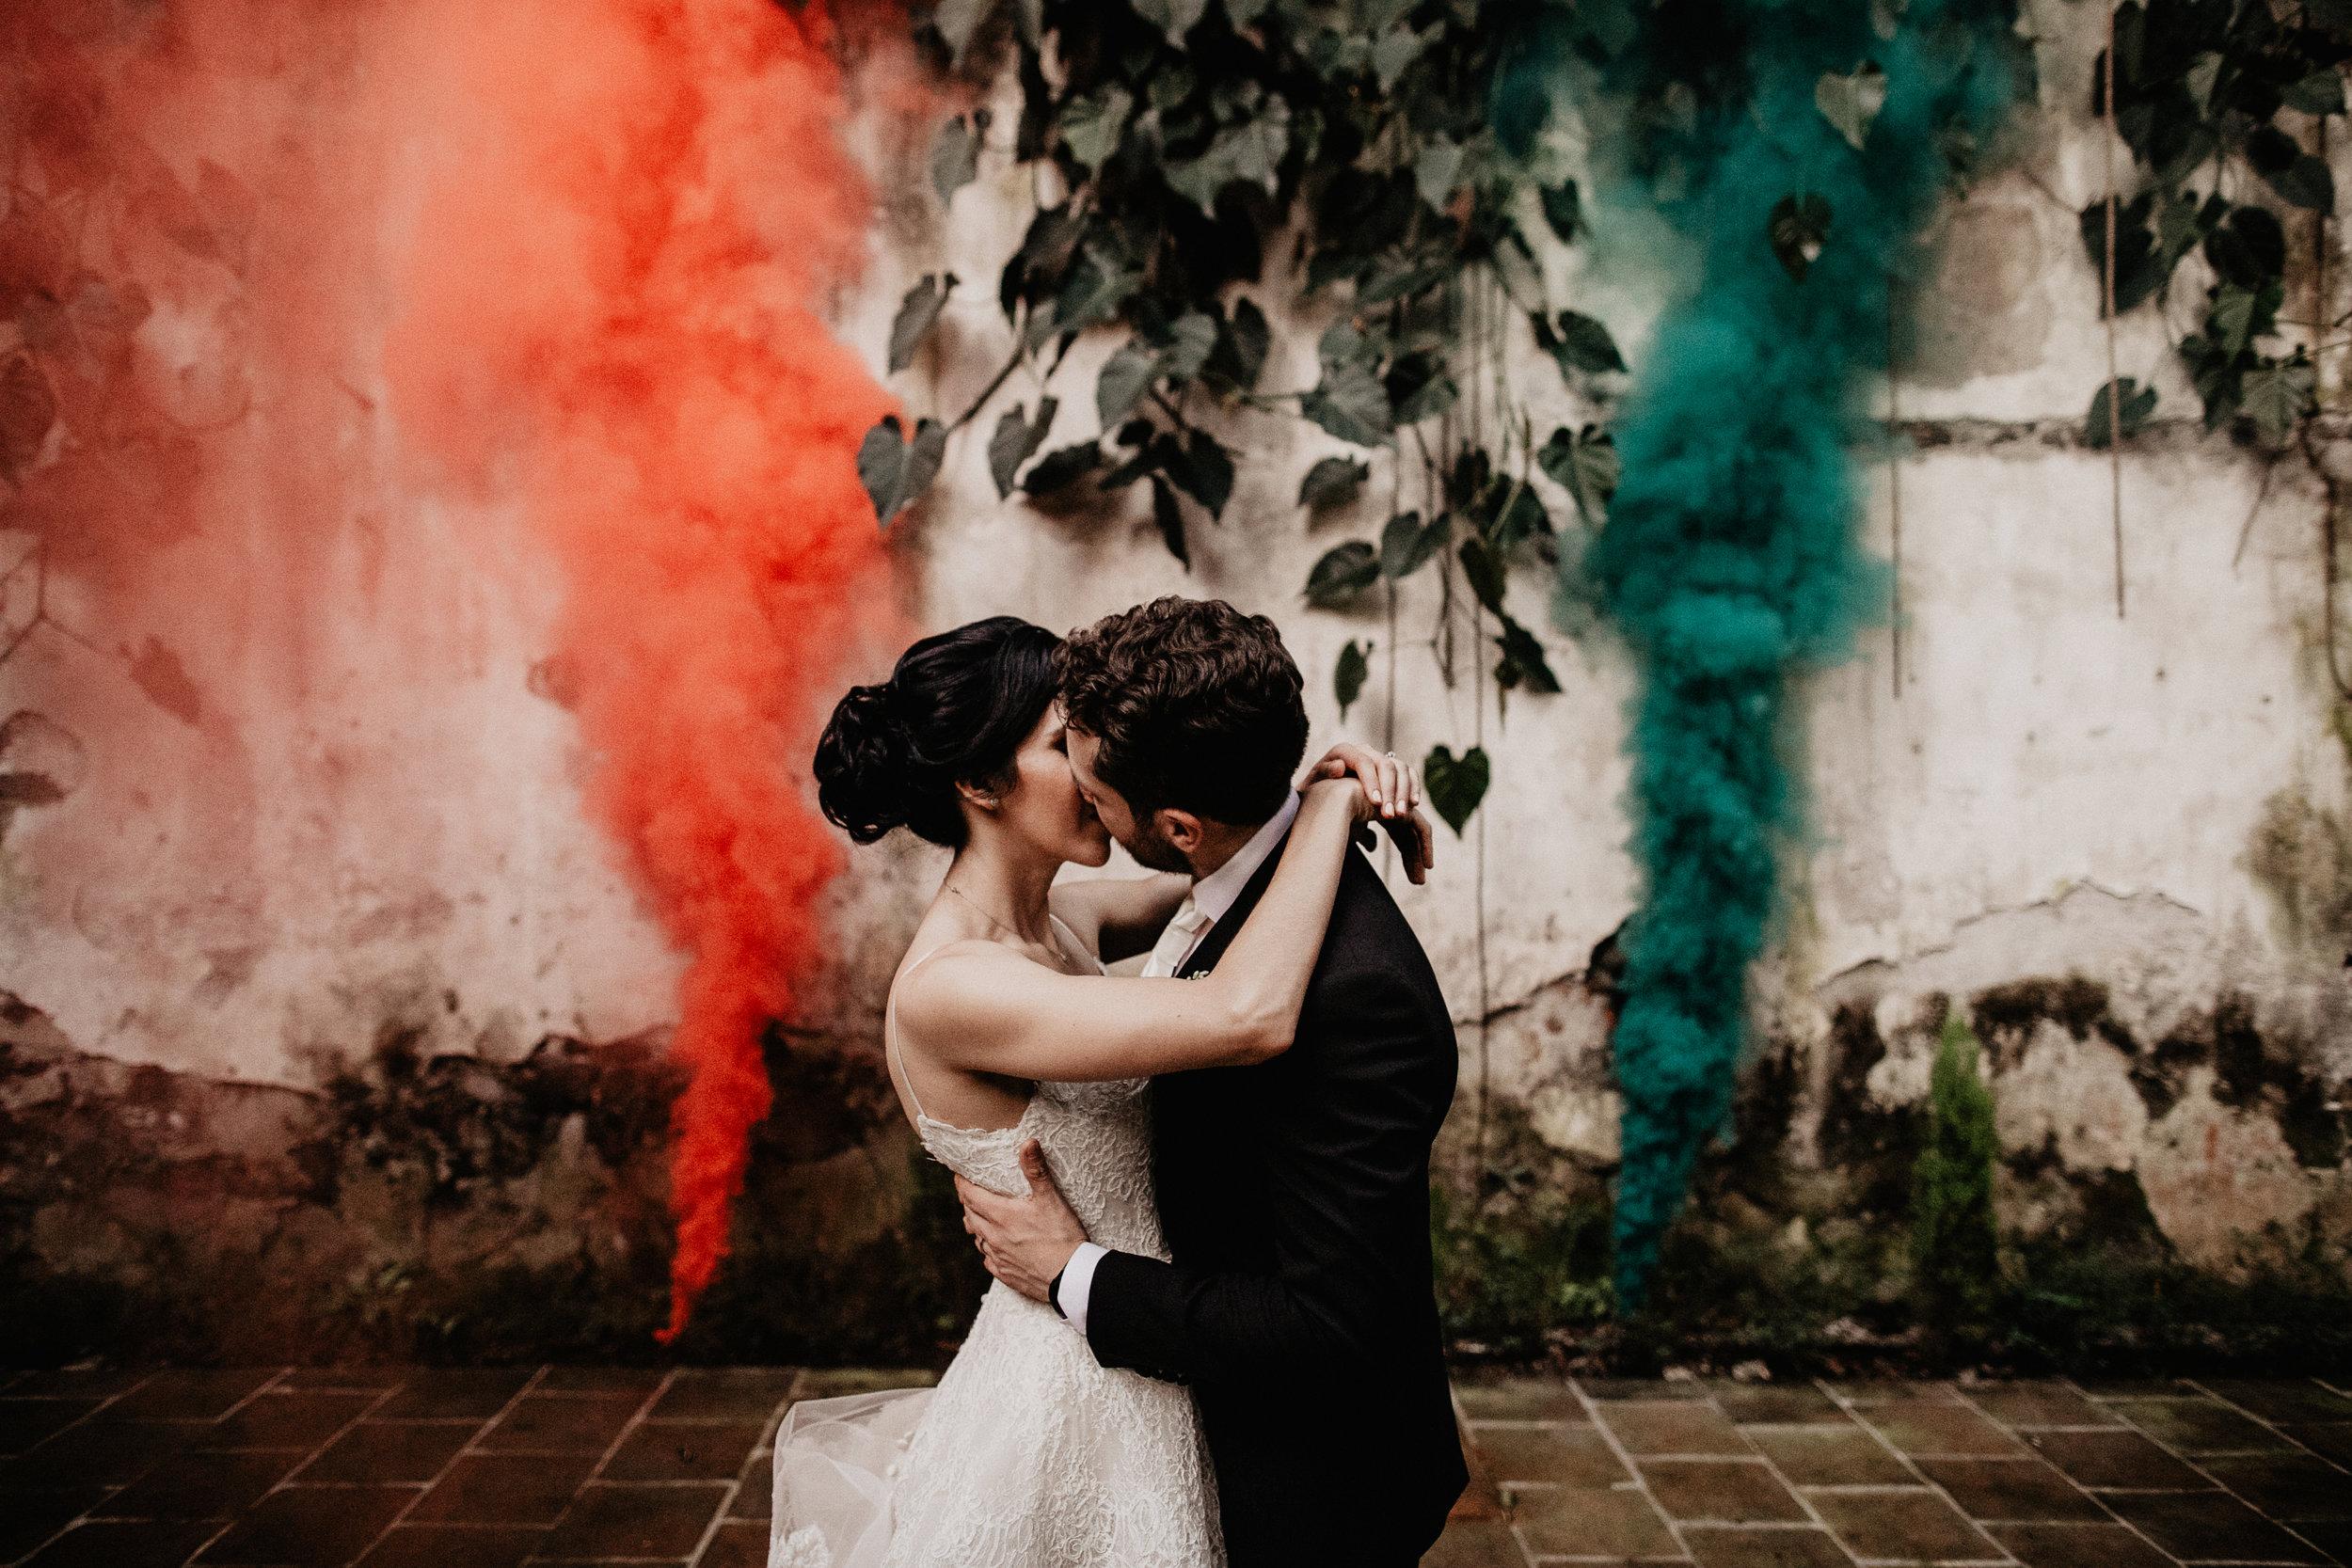 Alfonso_flores_destination_wedding_photography_vanesa_carlos-885.JPG